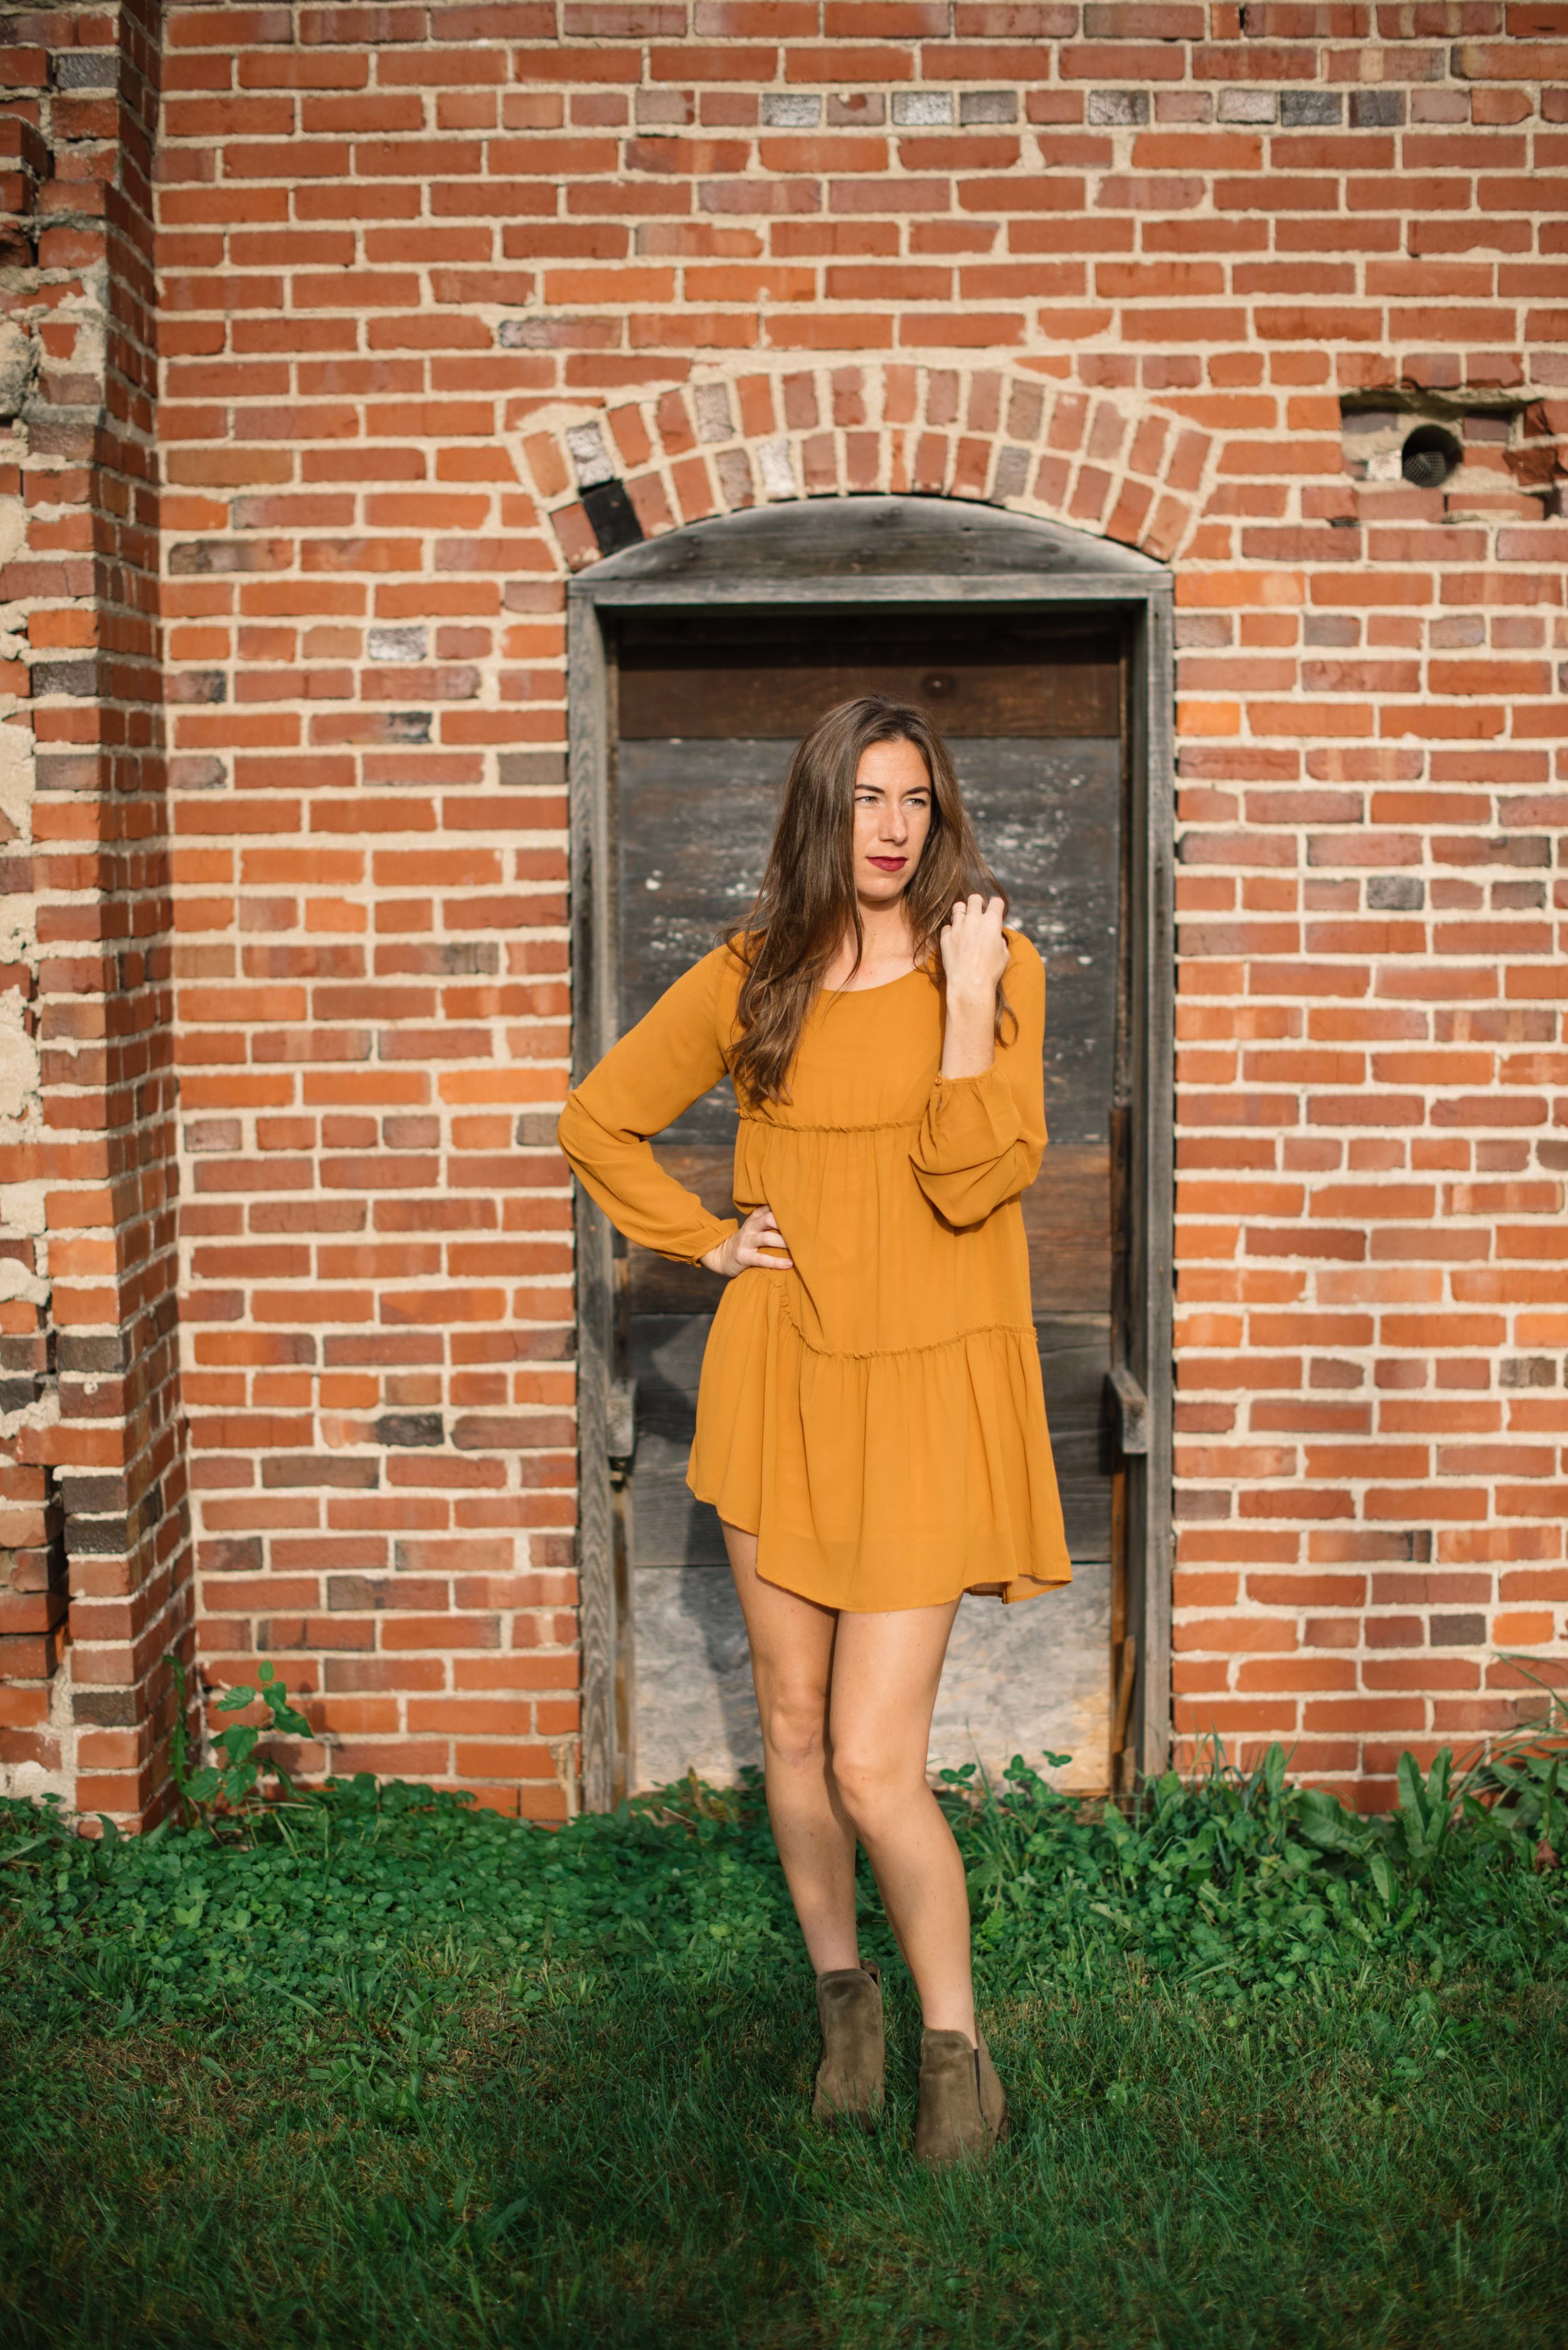 StephanieFallLooks-87.jpg